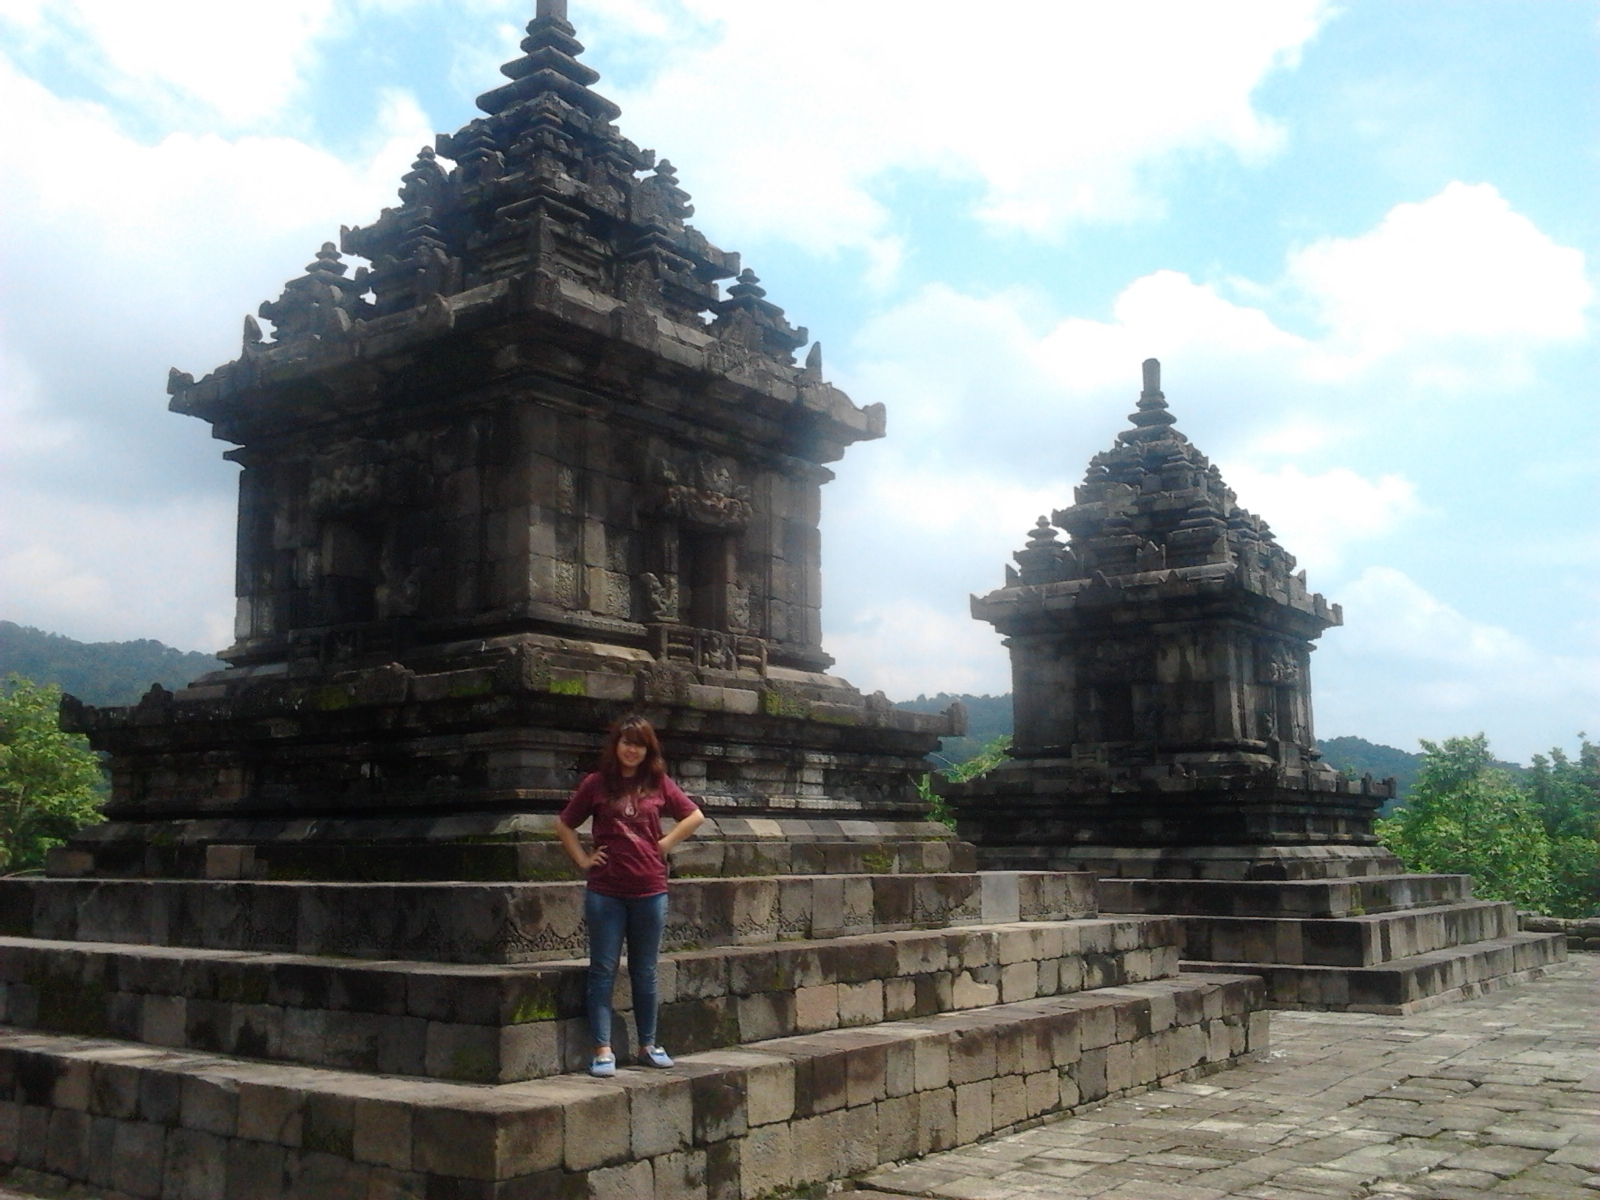 Veronikadiahkusumawati Candi Barong Kabupaten Sleman Dua Dewa Wisnu Dewi Sri